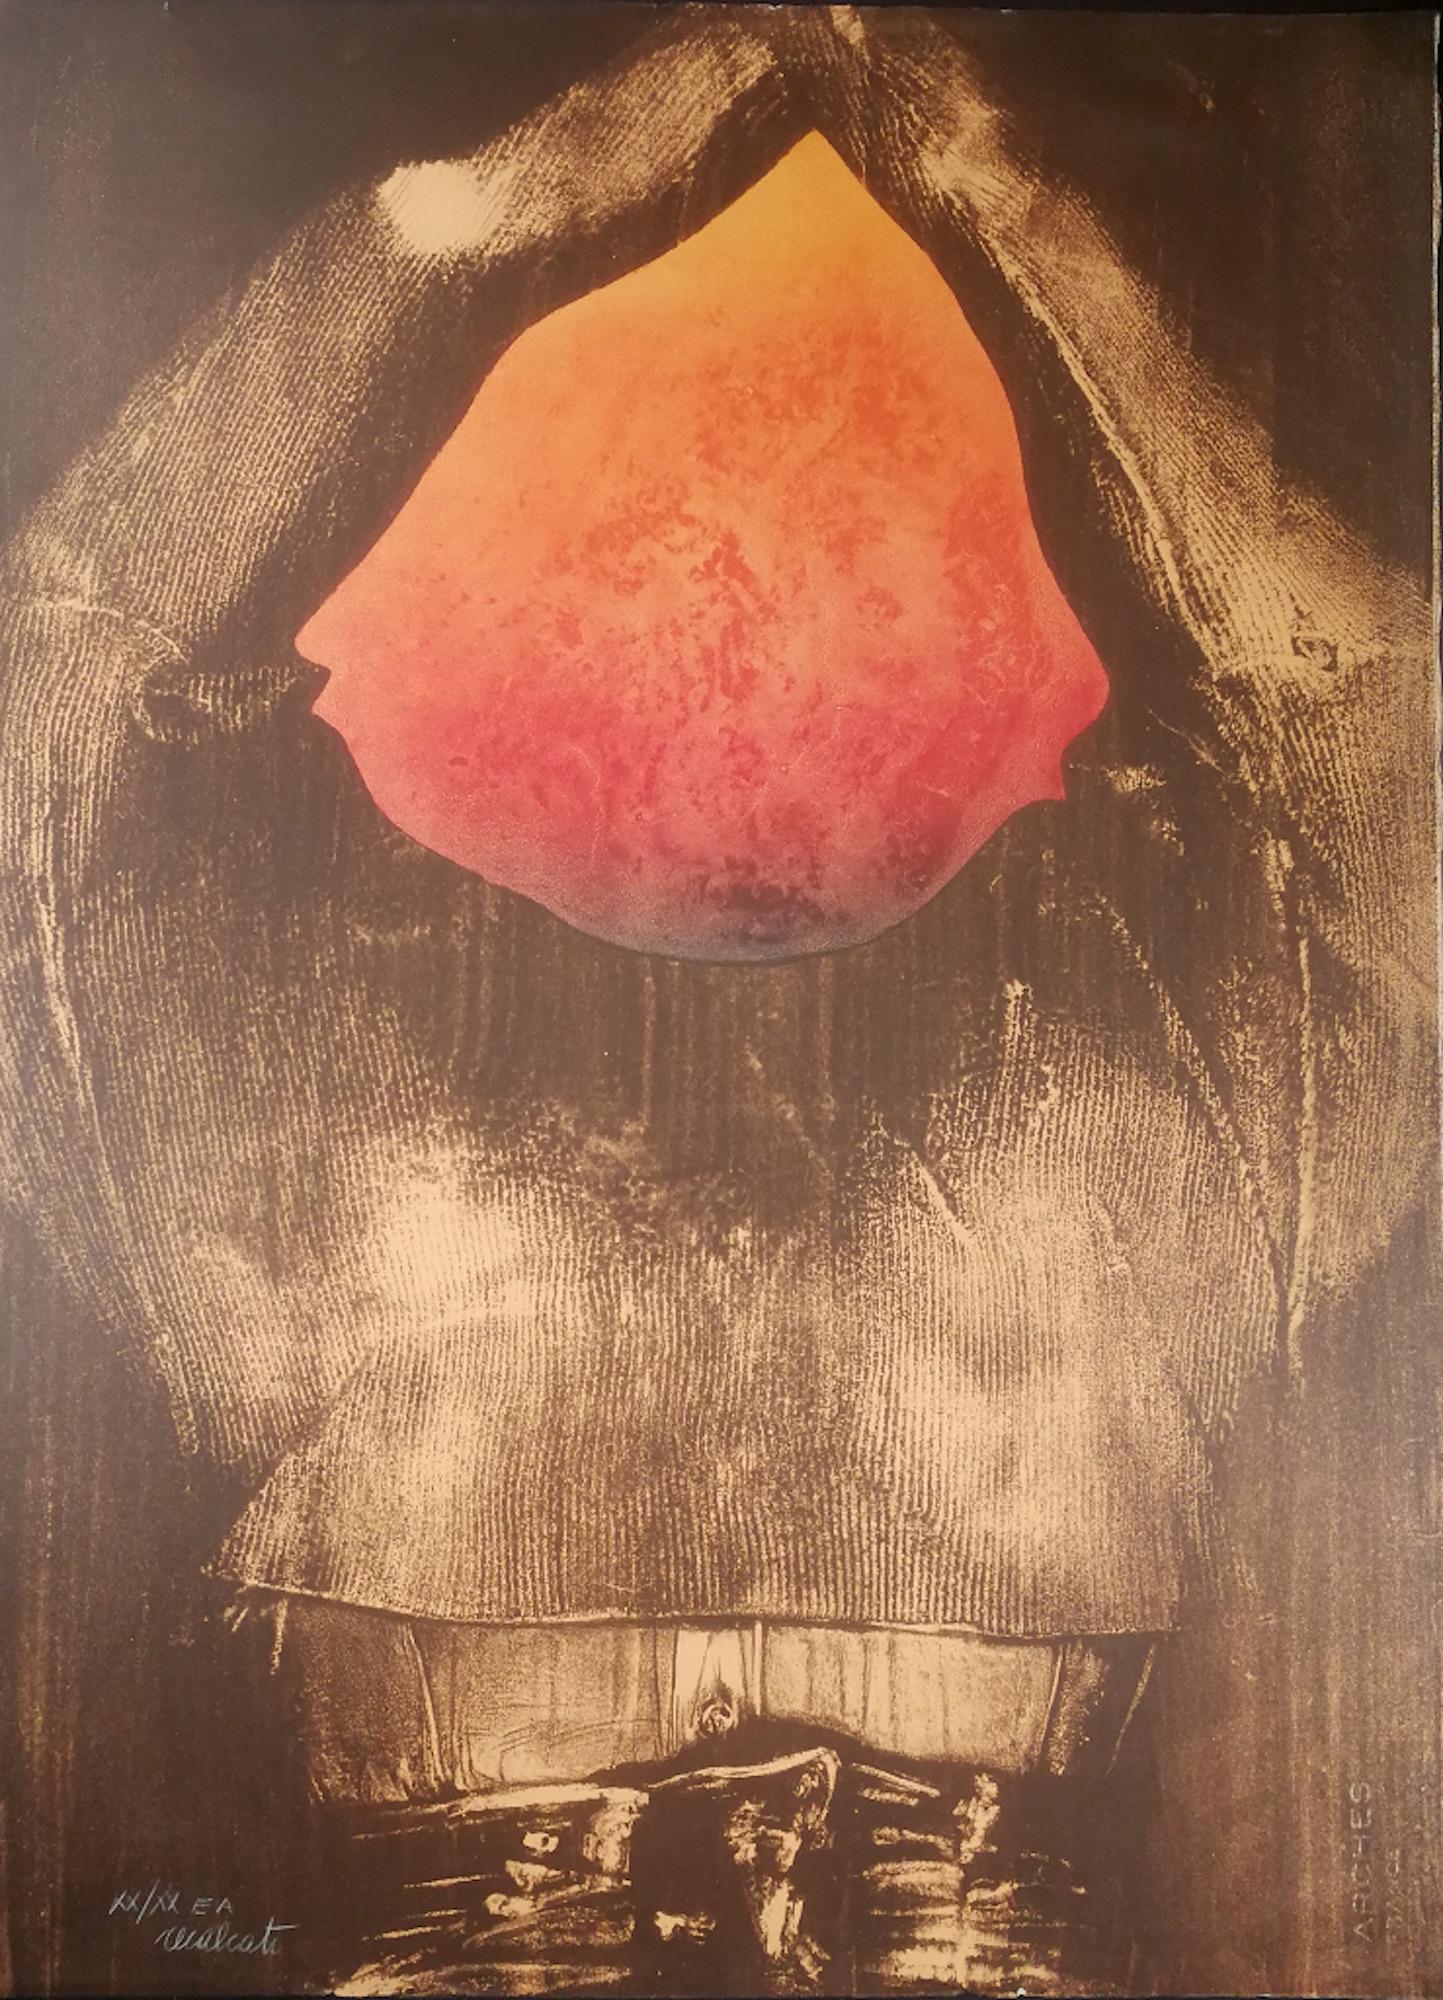 Composition - Original Silkscreen by Antonio Recalcati - Late 1900